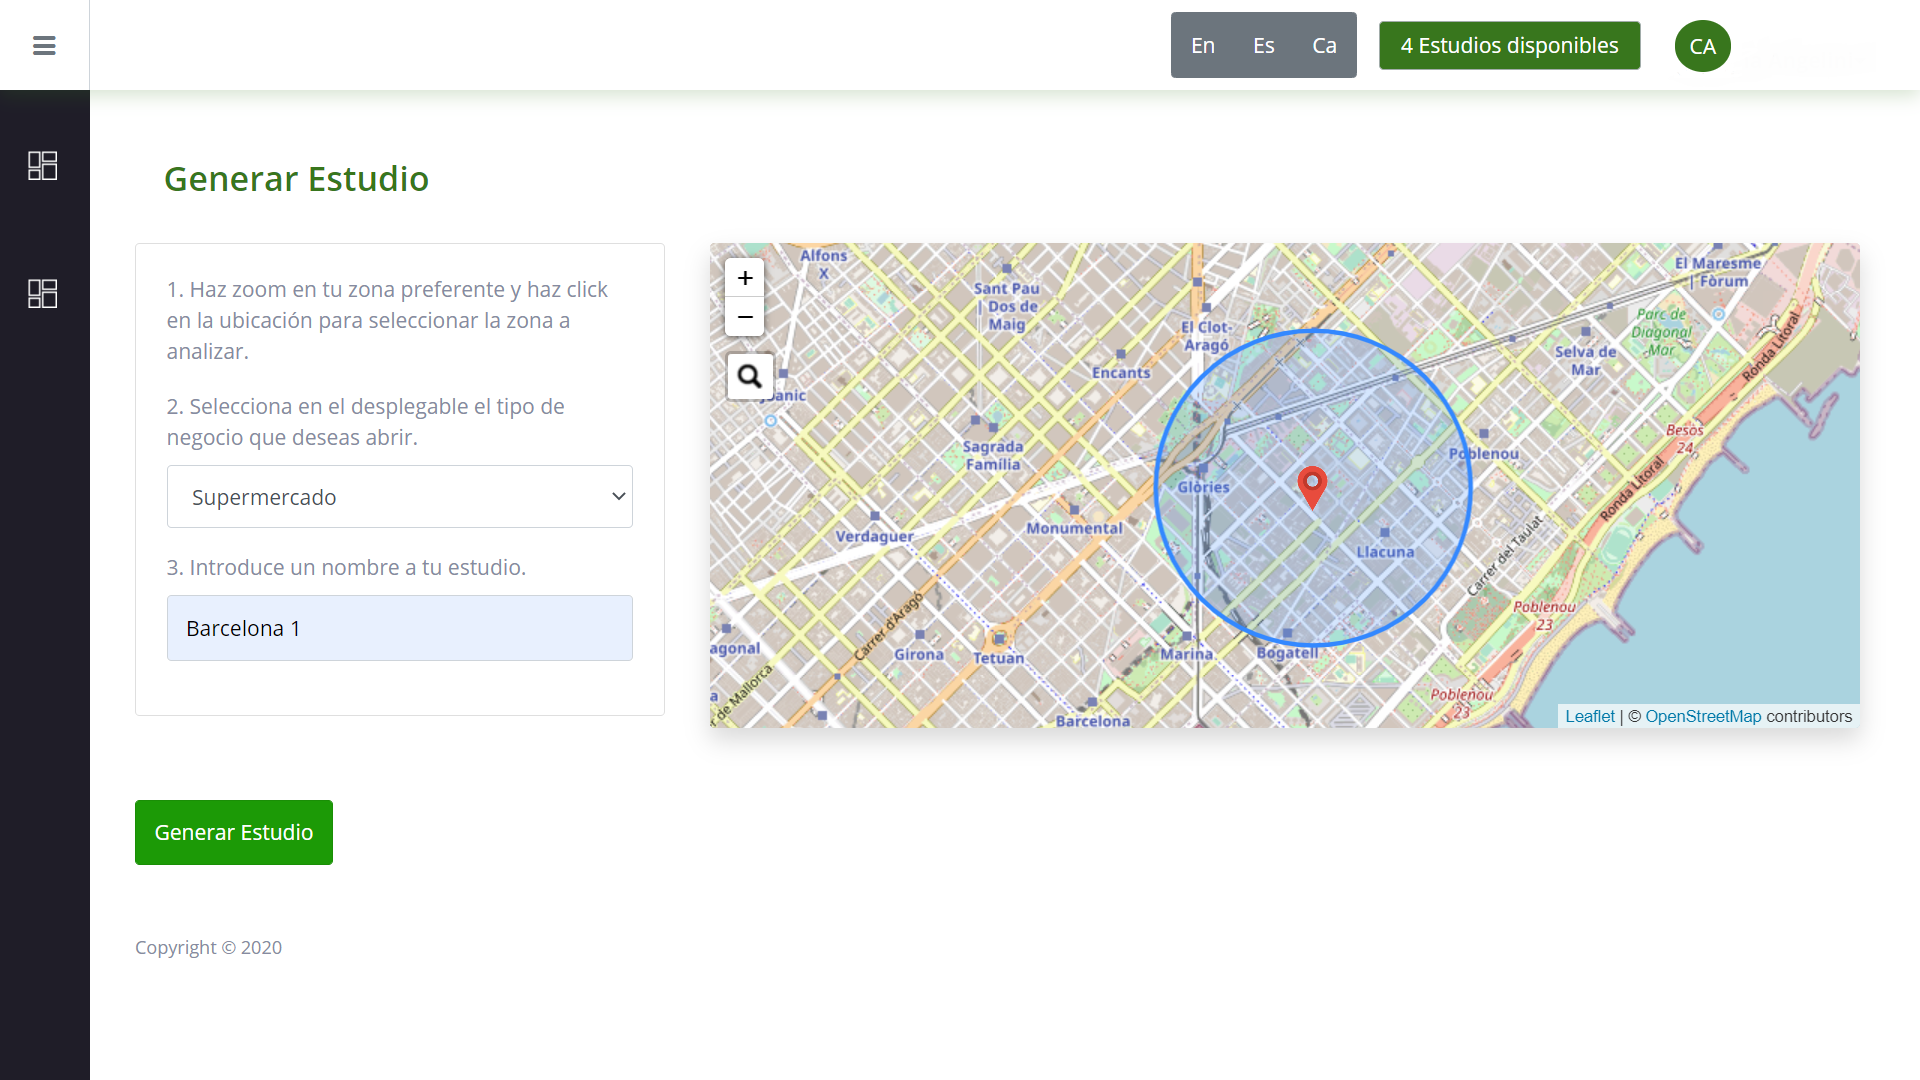 Mapa de ubicación de empresa en Barcelona